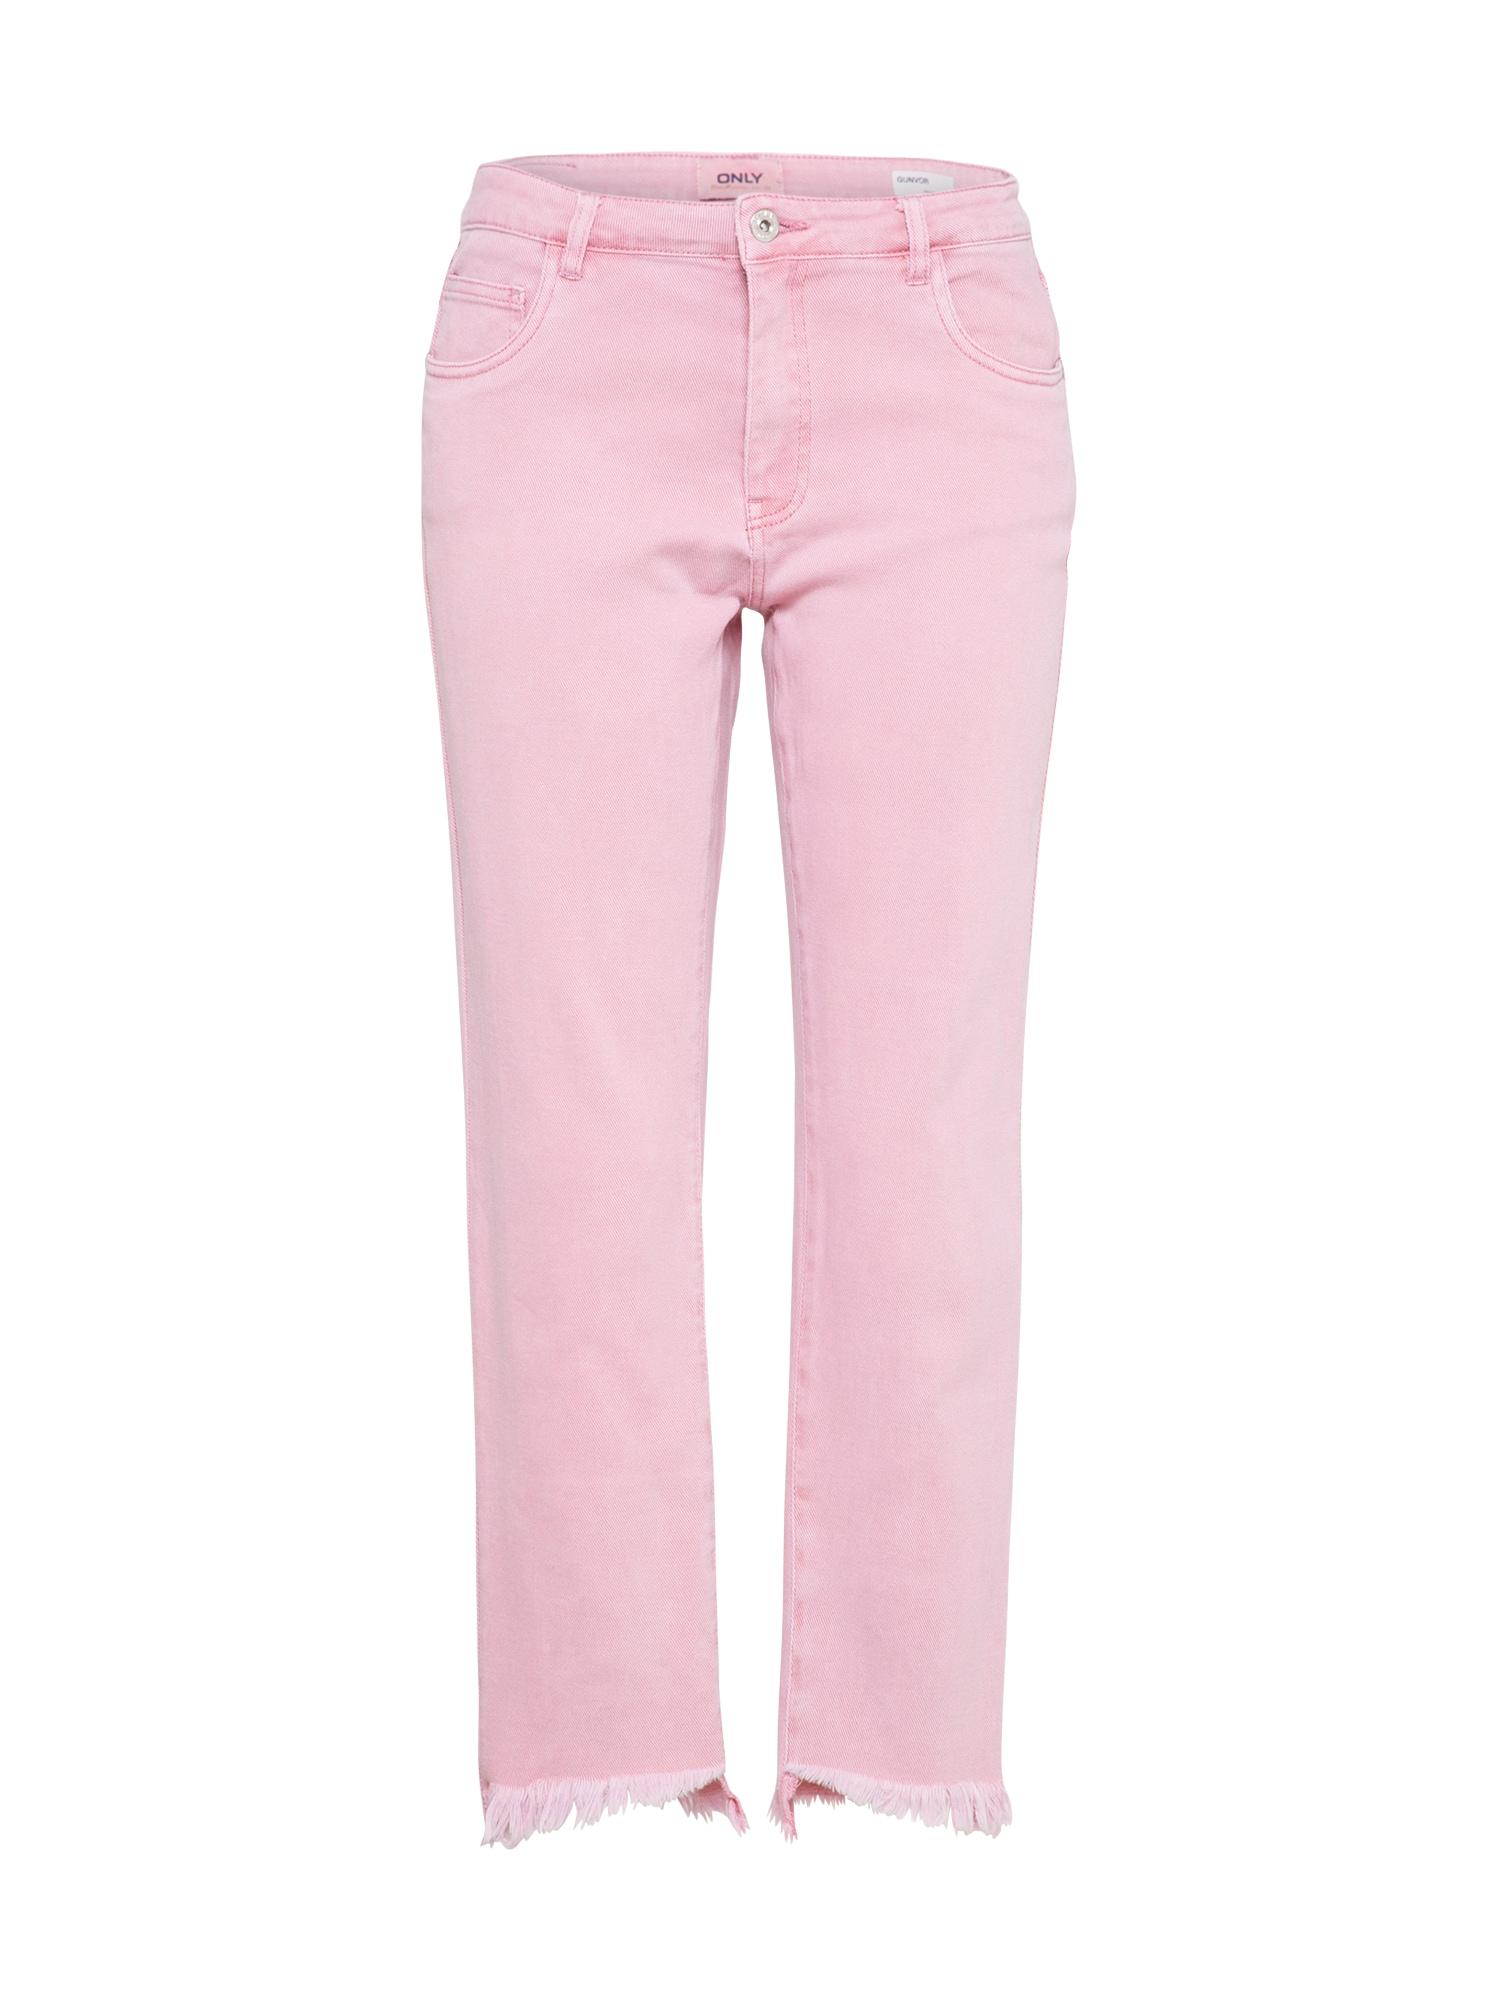 Džíny onlGUNVOR pink ONLY